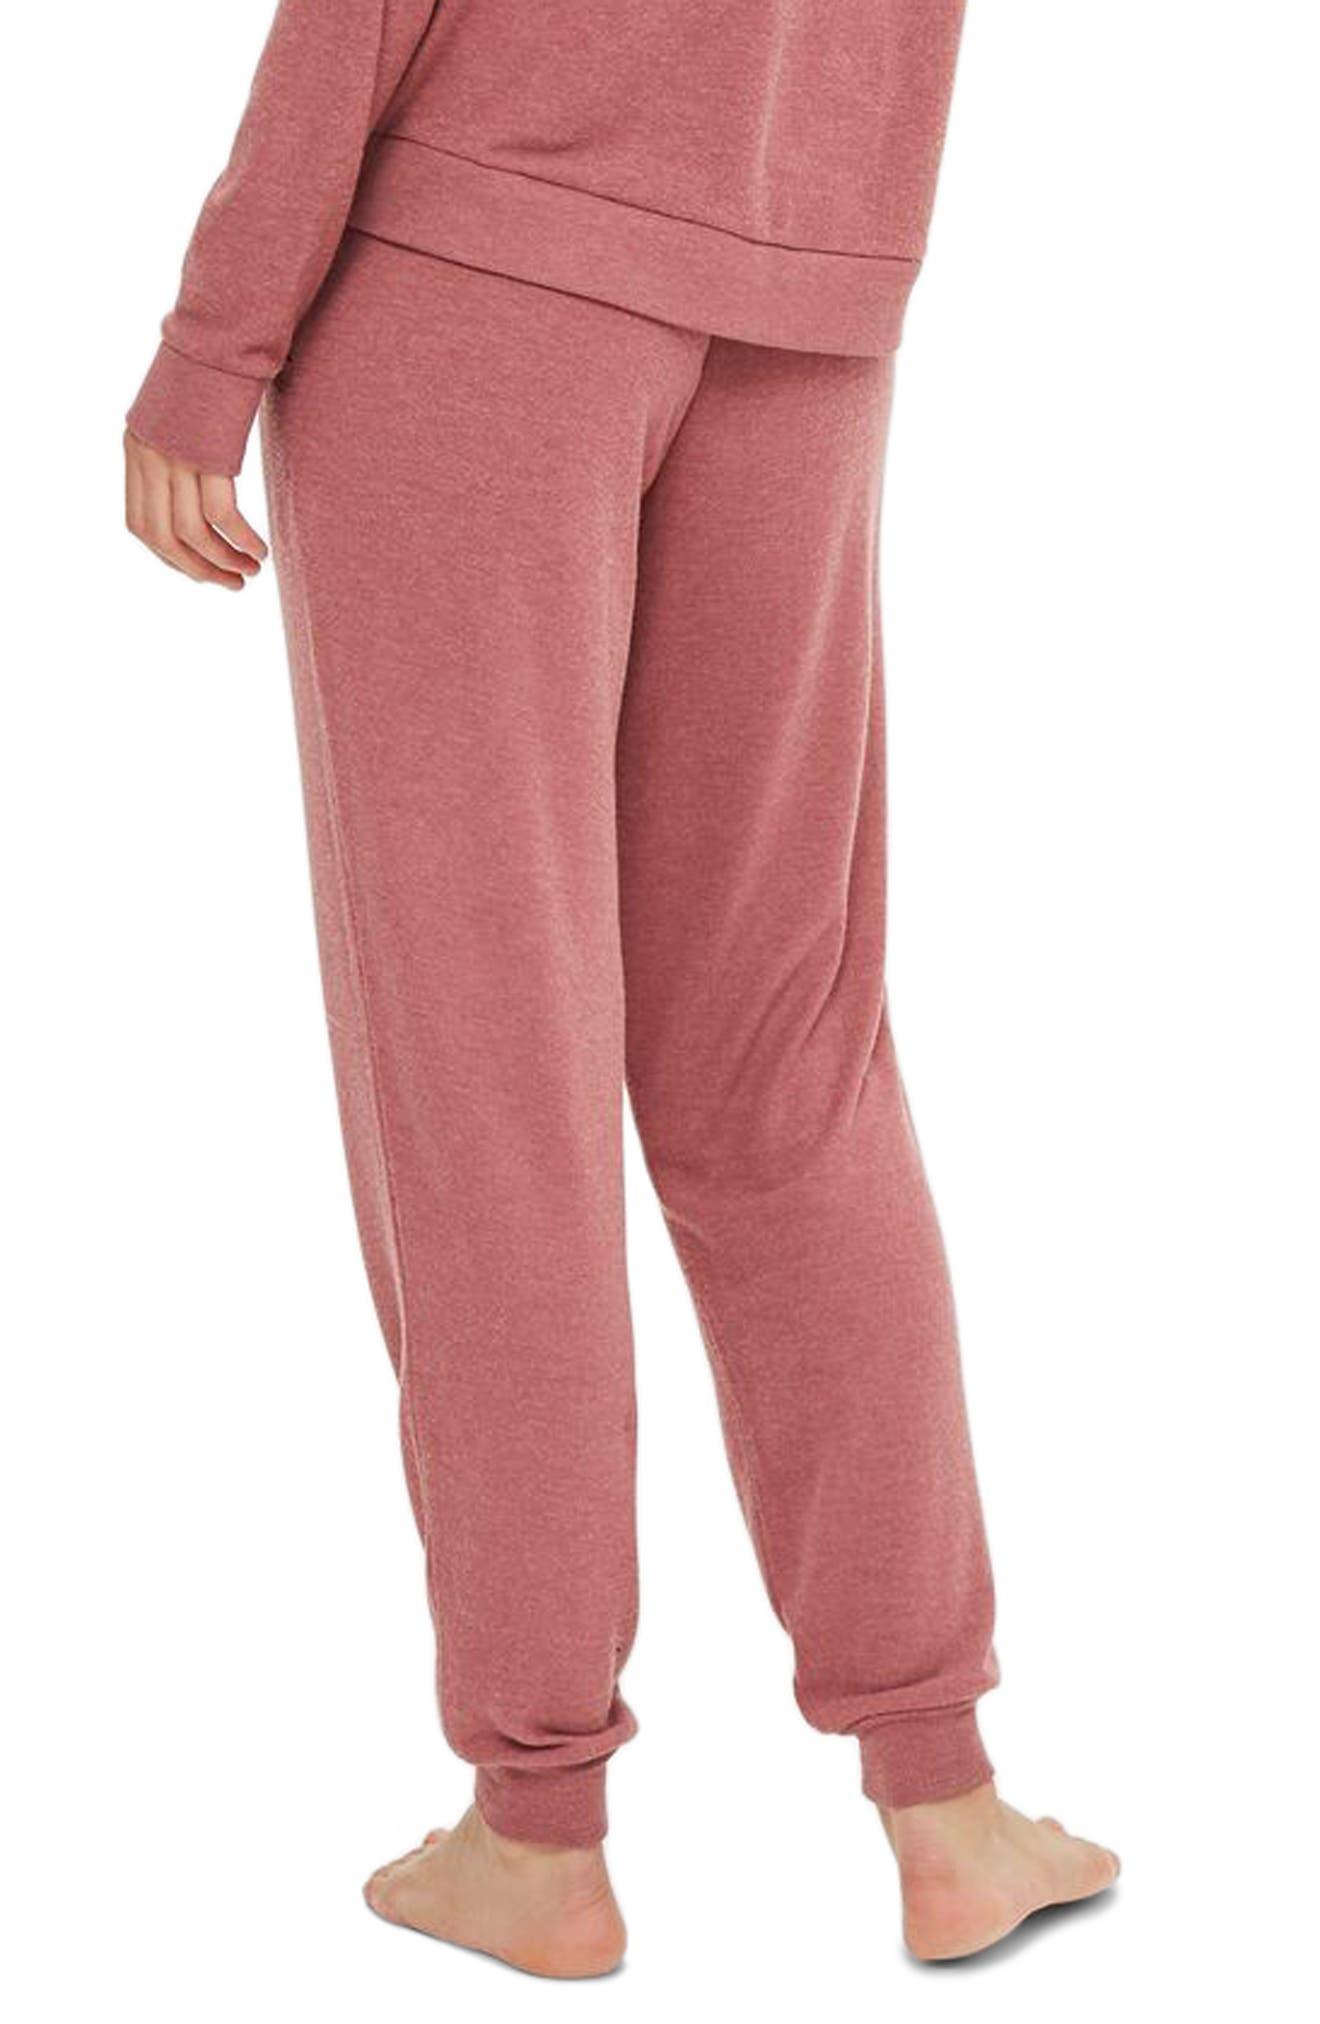 Rose Jogger Pajama Pants,                             Alternate thumbnail 2, color,                             Pink